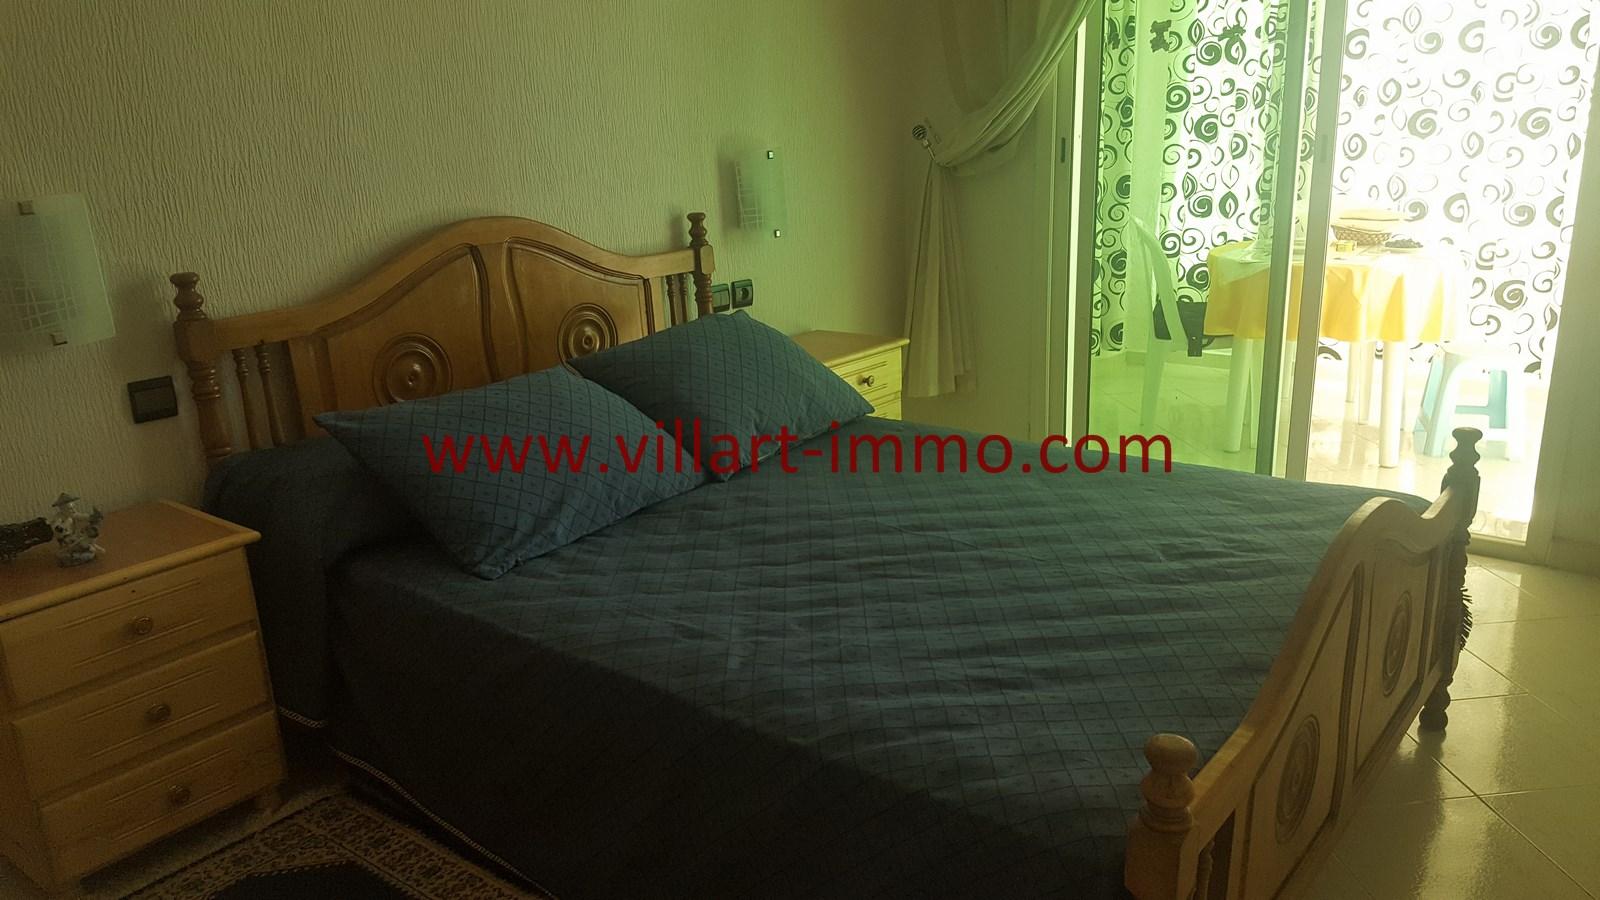 5-Vente-Appartement-Assilah-Chambre 1-VA508-Villart Immo